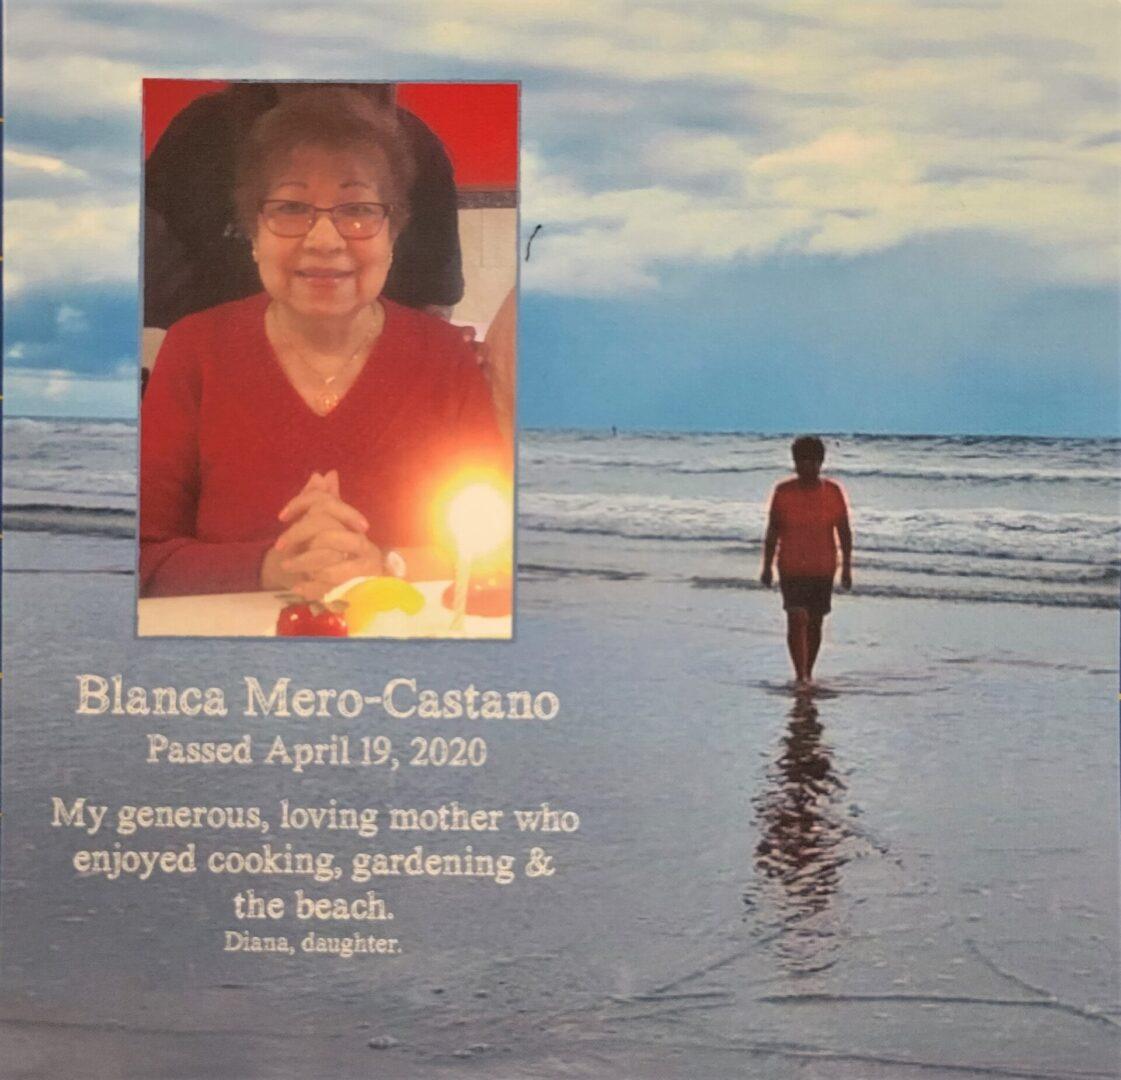 IN MEMORY OF BLANCA MERO-CASTANO - DIED APRIL 19, 2020